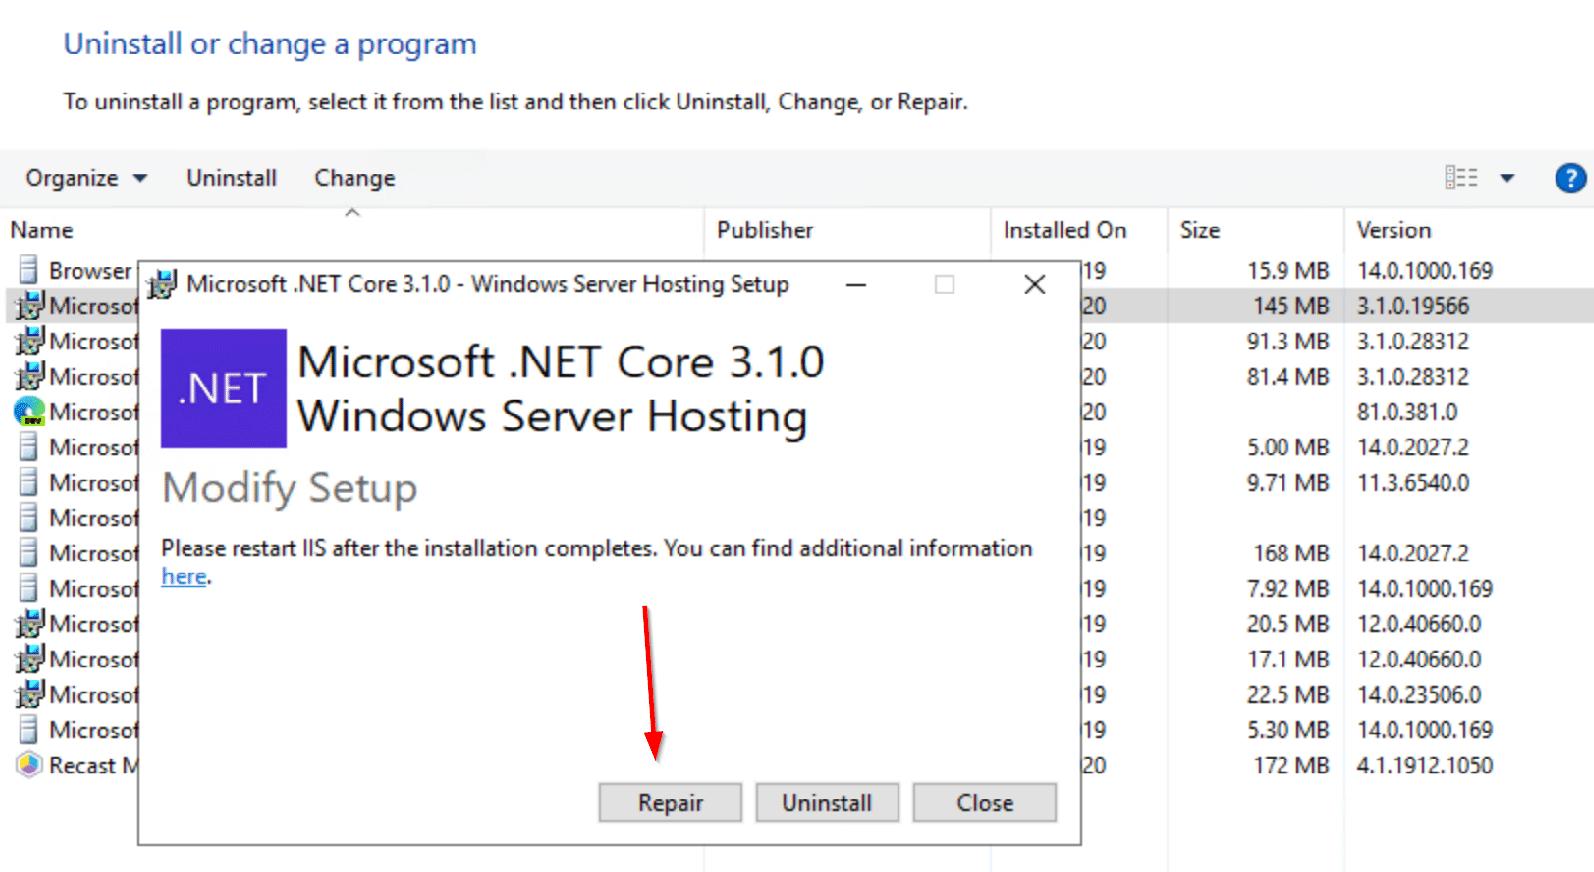 Run a Repair on .Net Core 3.1.0 Windows Server Hosting